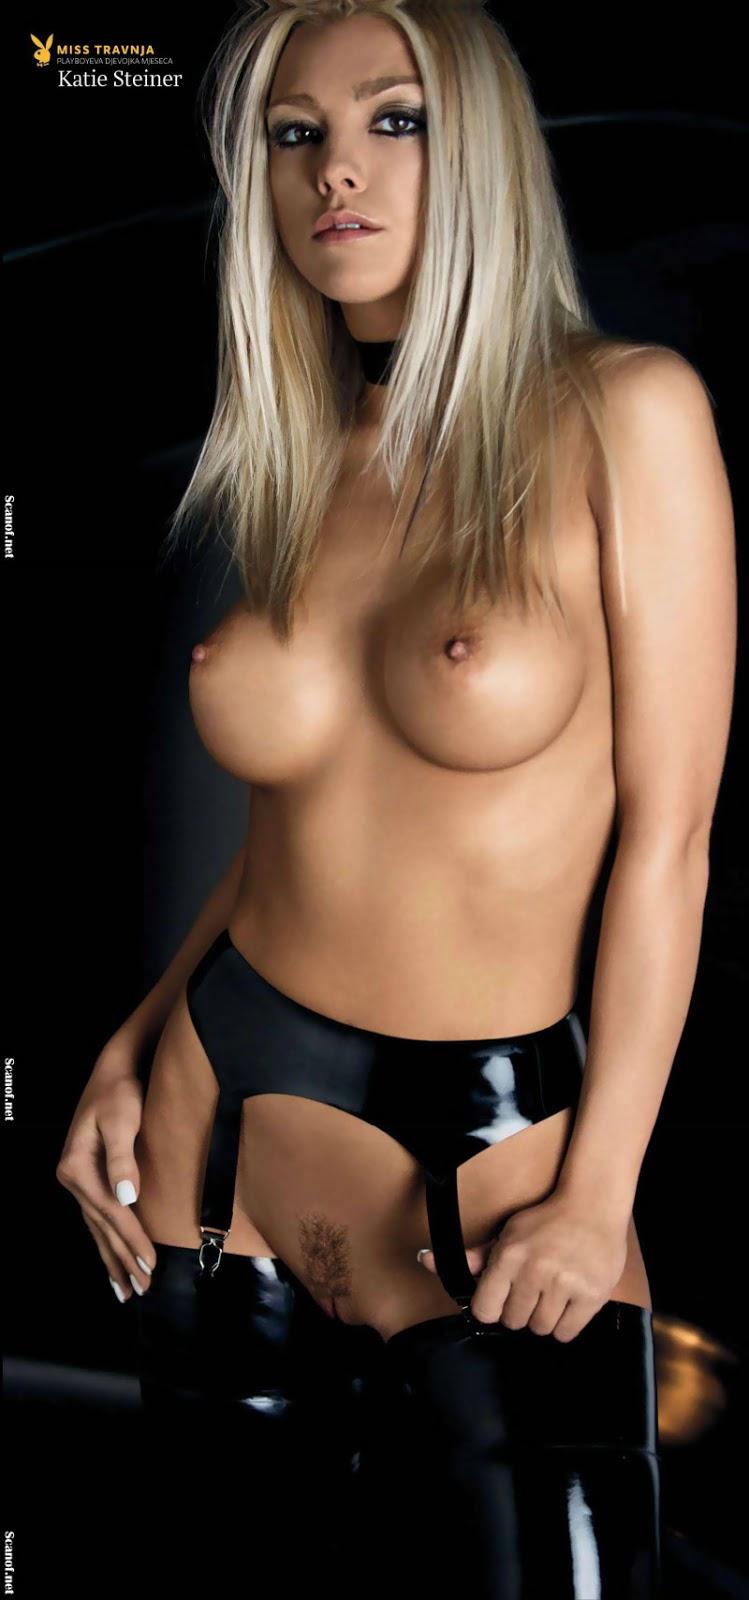 Jordan Katie pic porno prix GILF vidéo de sexe